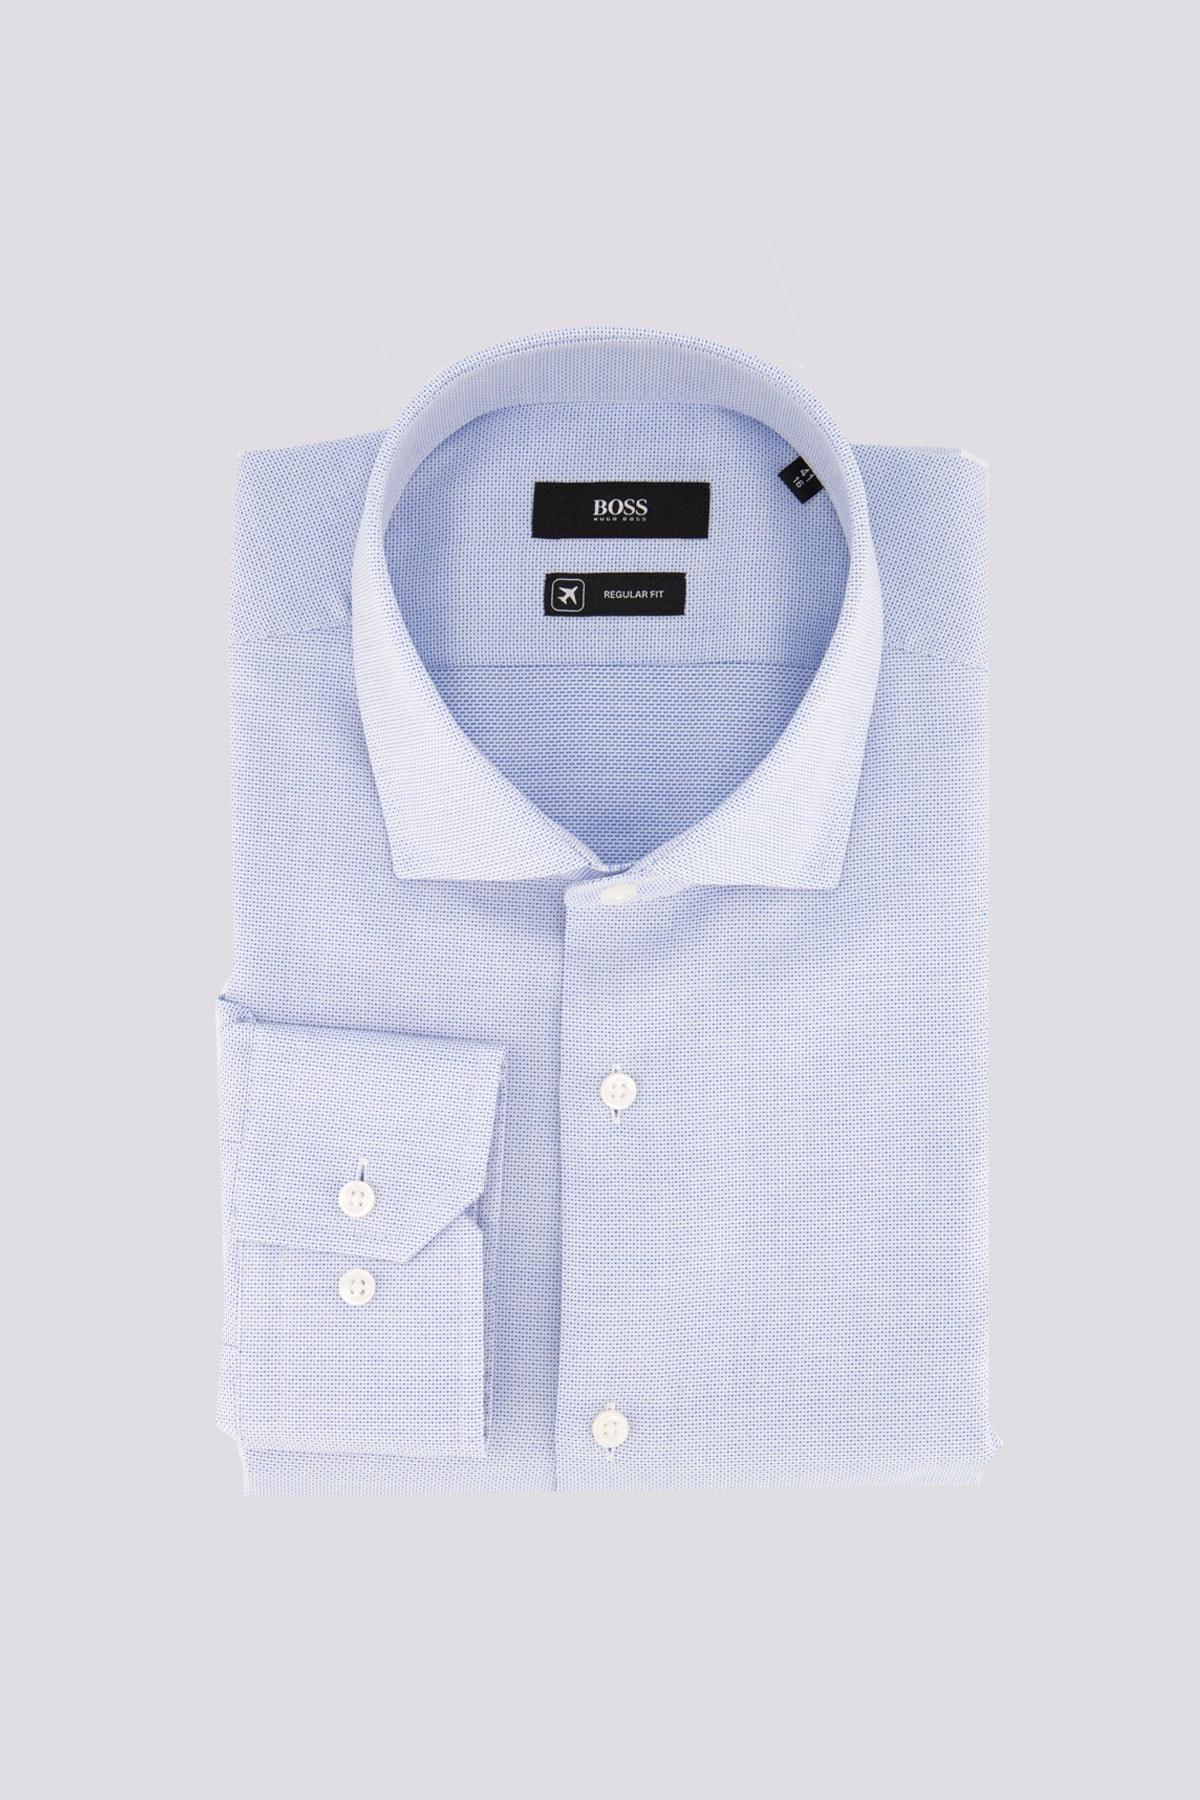 Camisa vestir marca BOSS con micro estructura azul claro